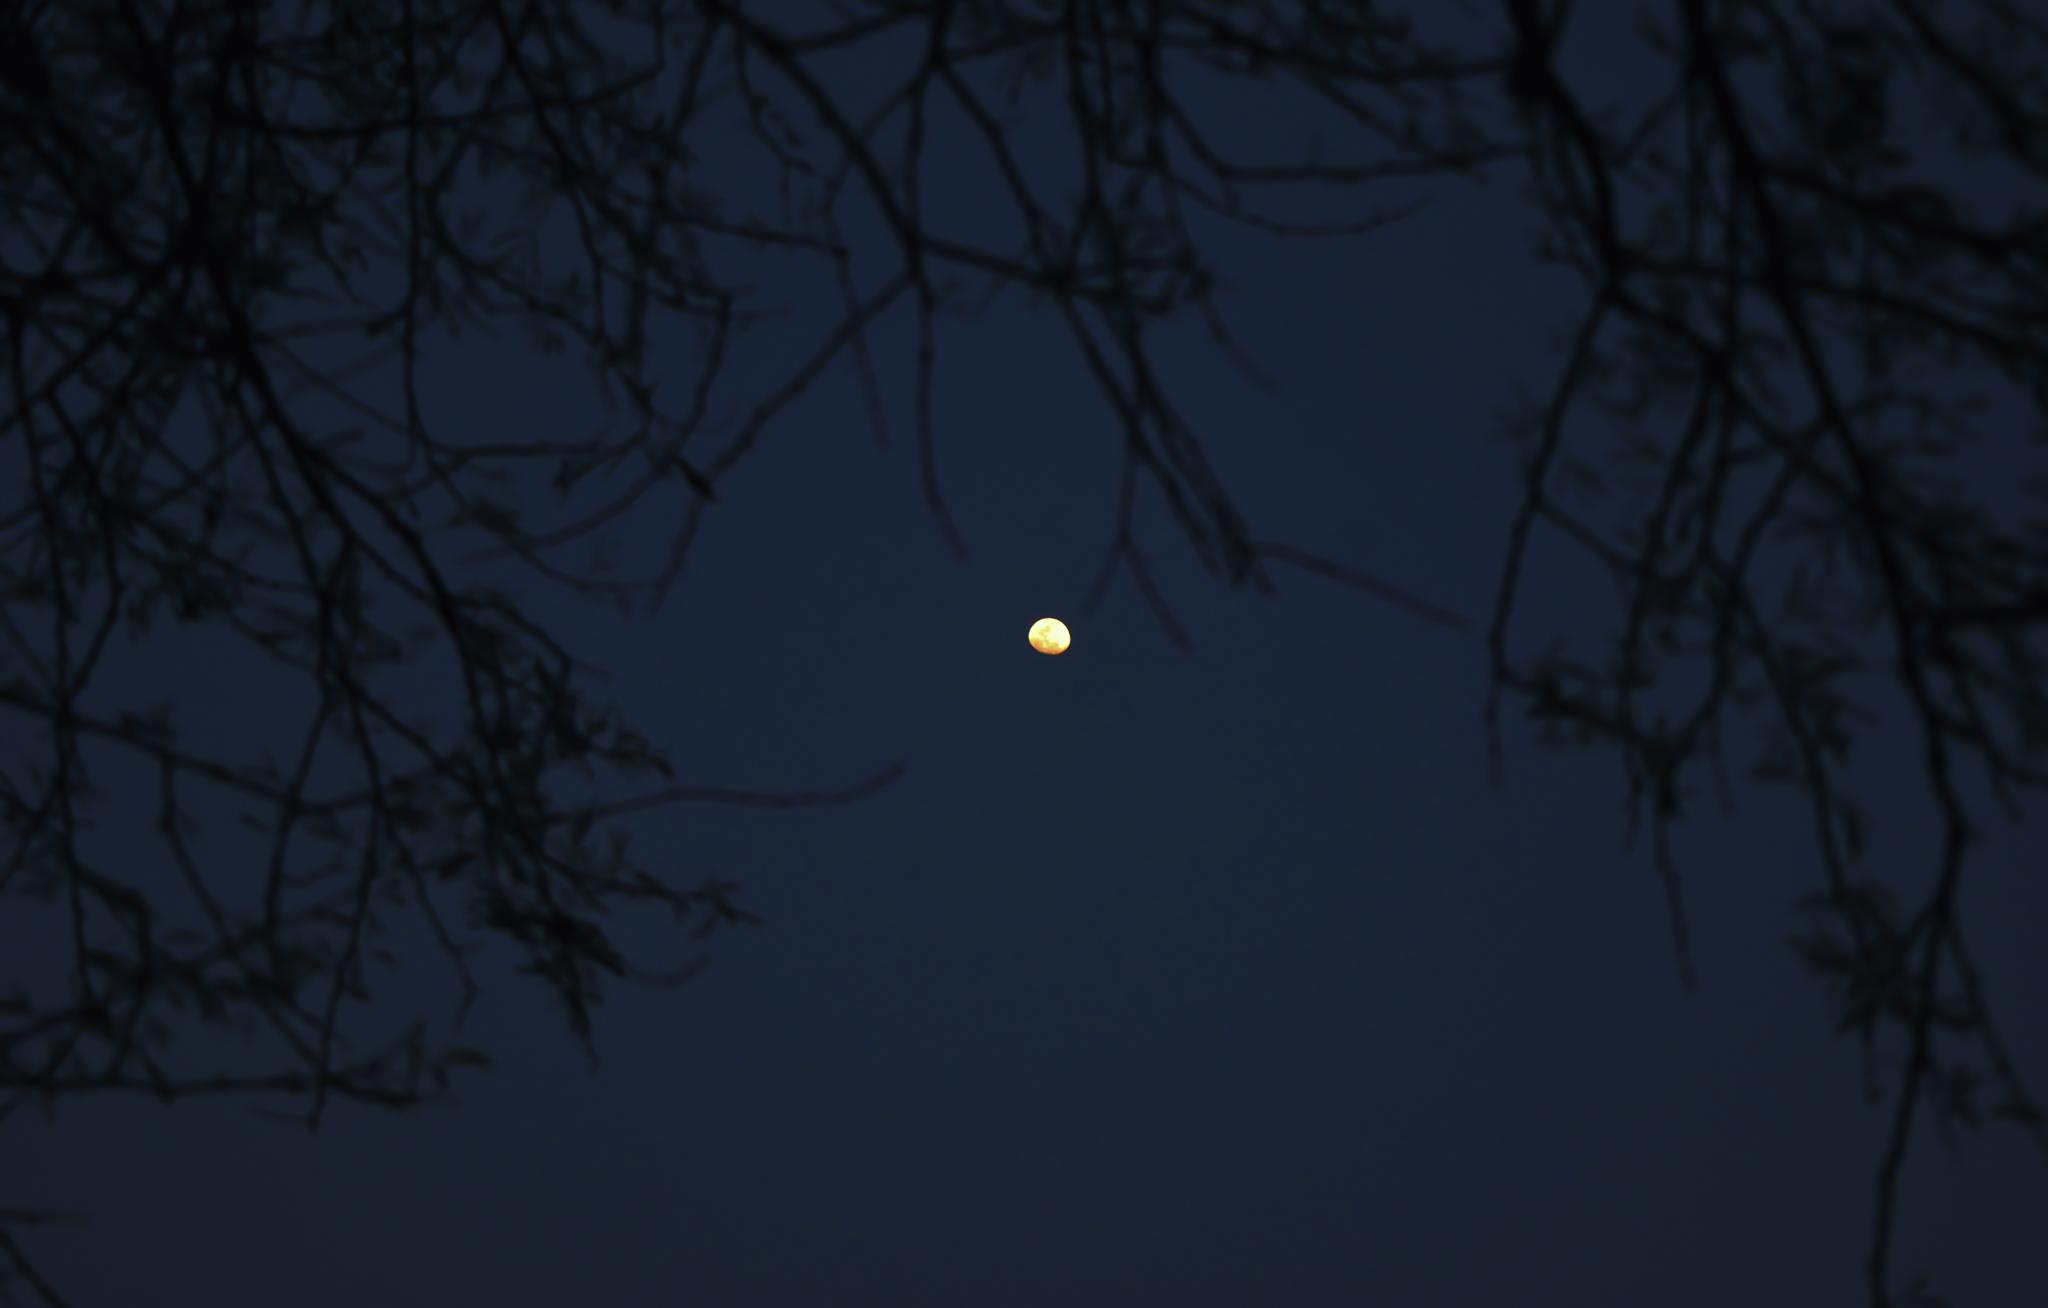 Moon by Joydip Ghosh